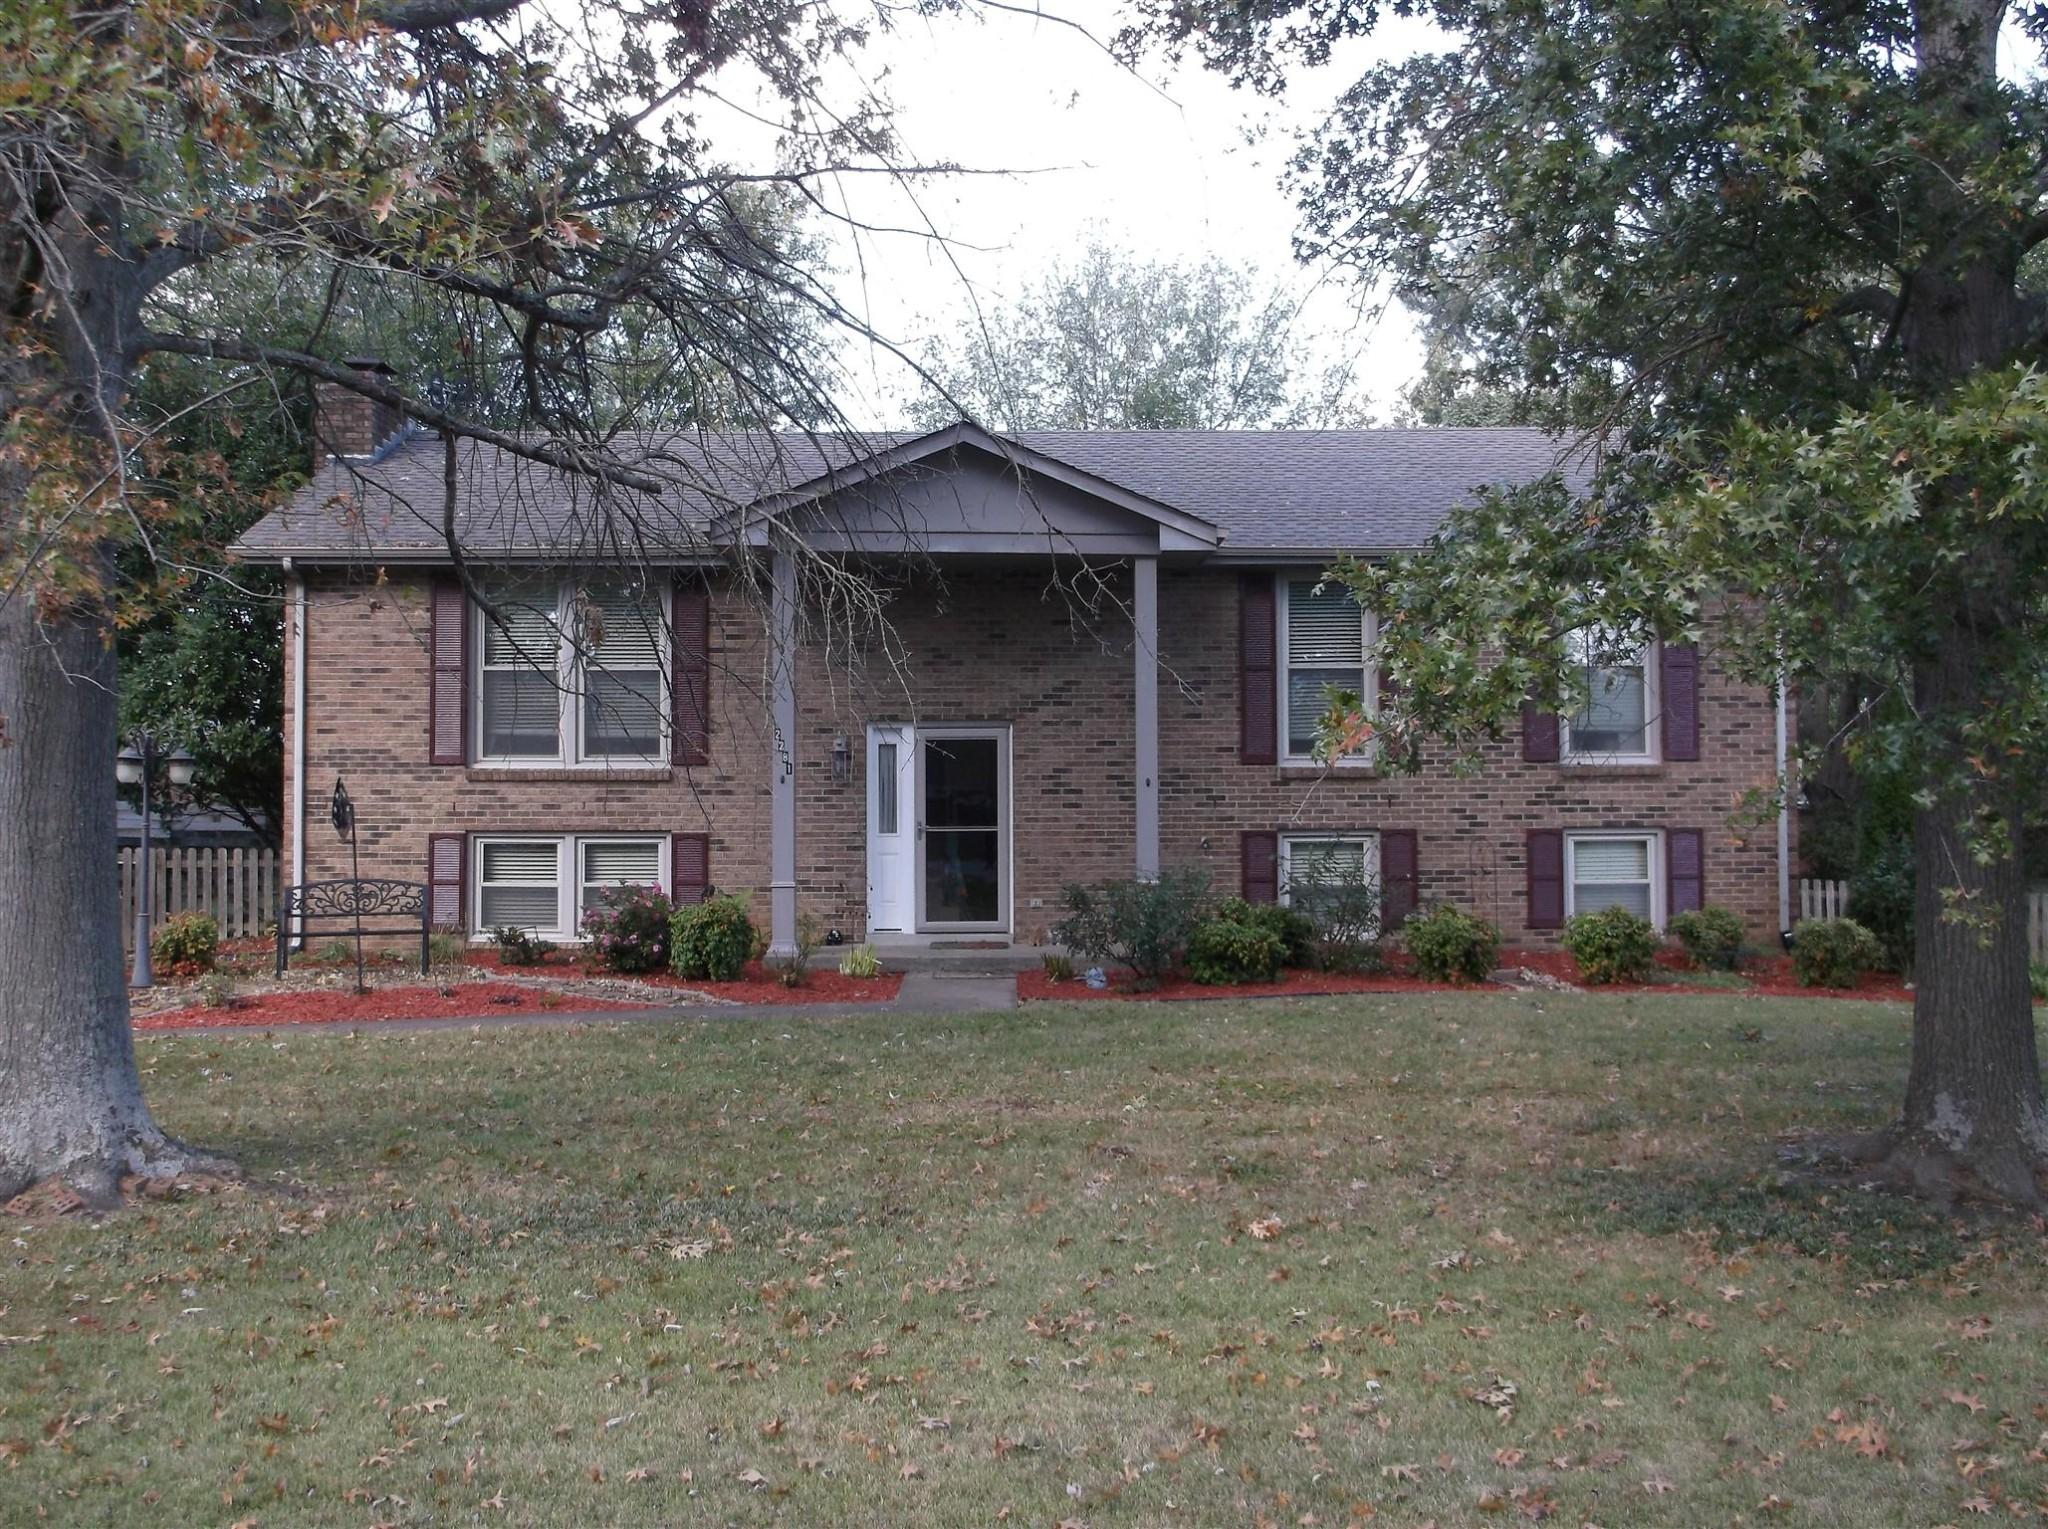 2281 Sentinel Dr, Clarksville, TN 37043 - Clarksville, TN real estate listing